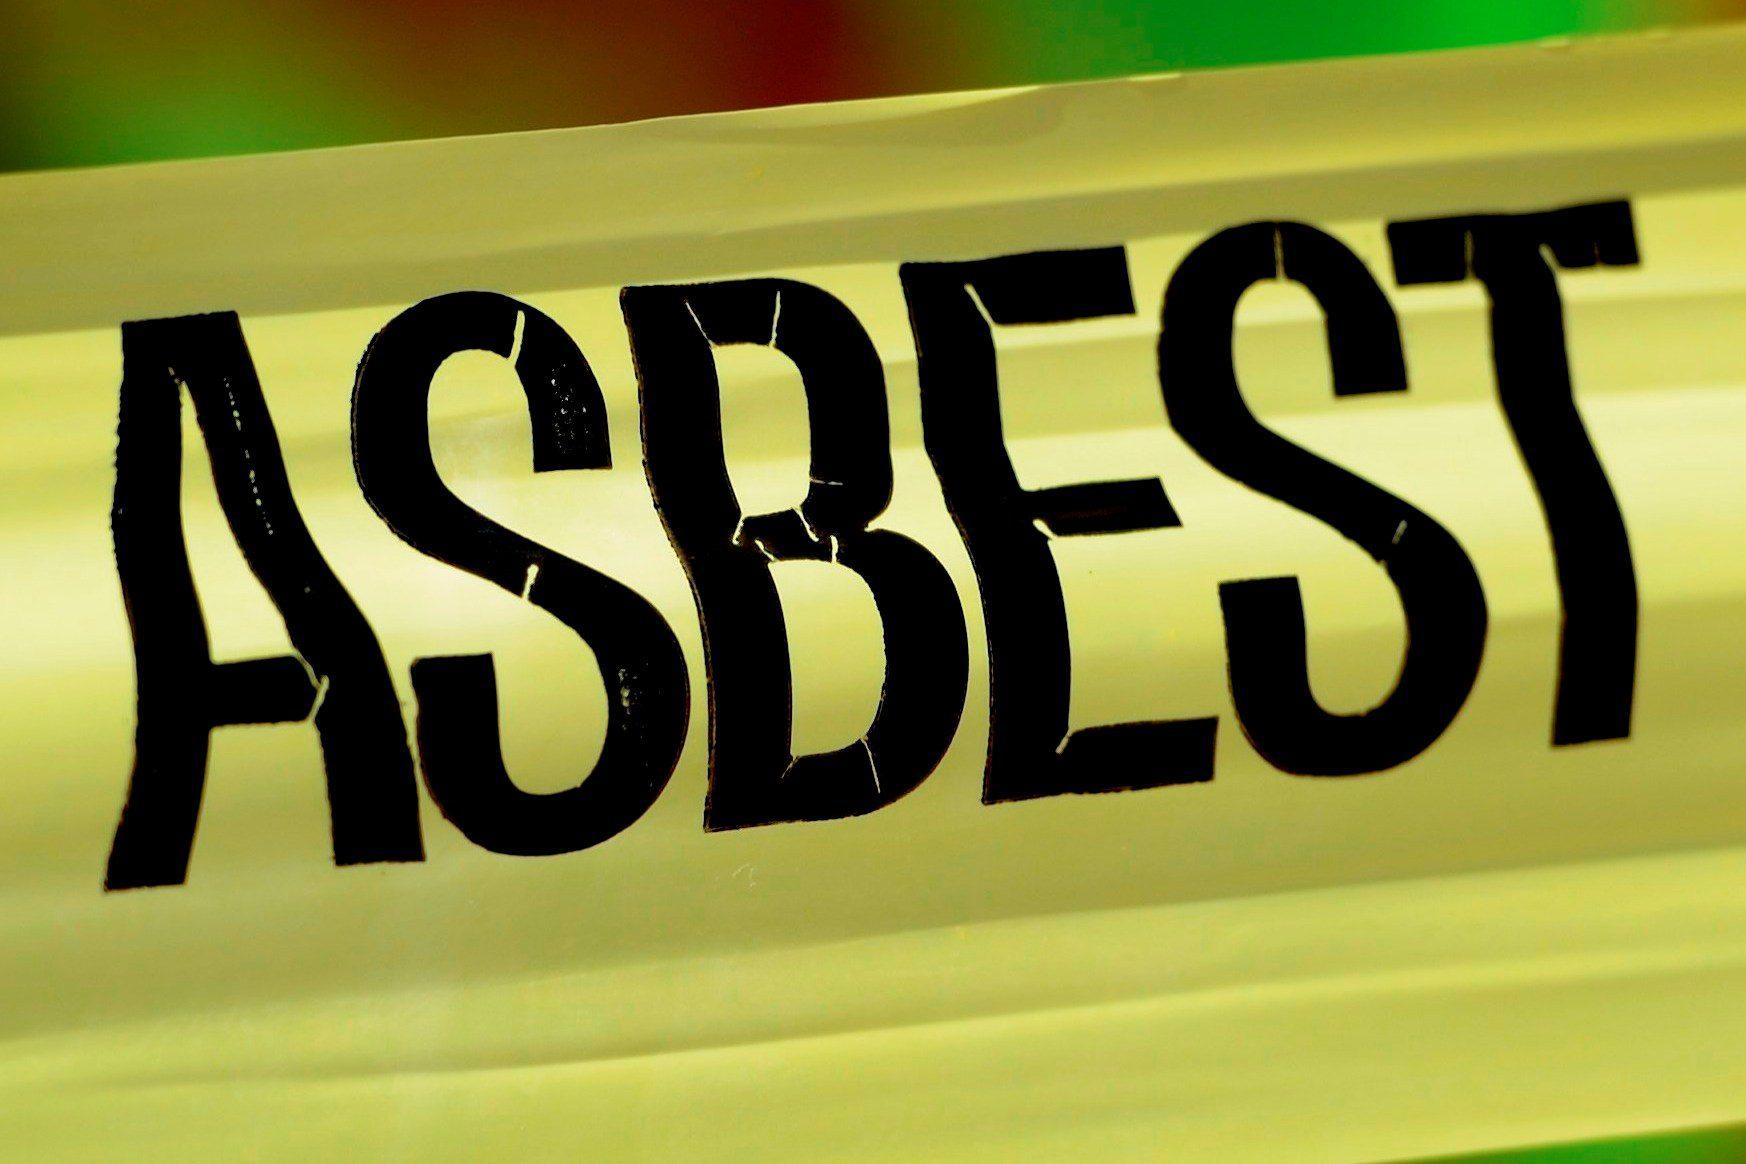 Asbestverbod, asbest